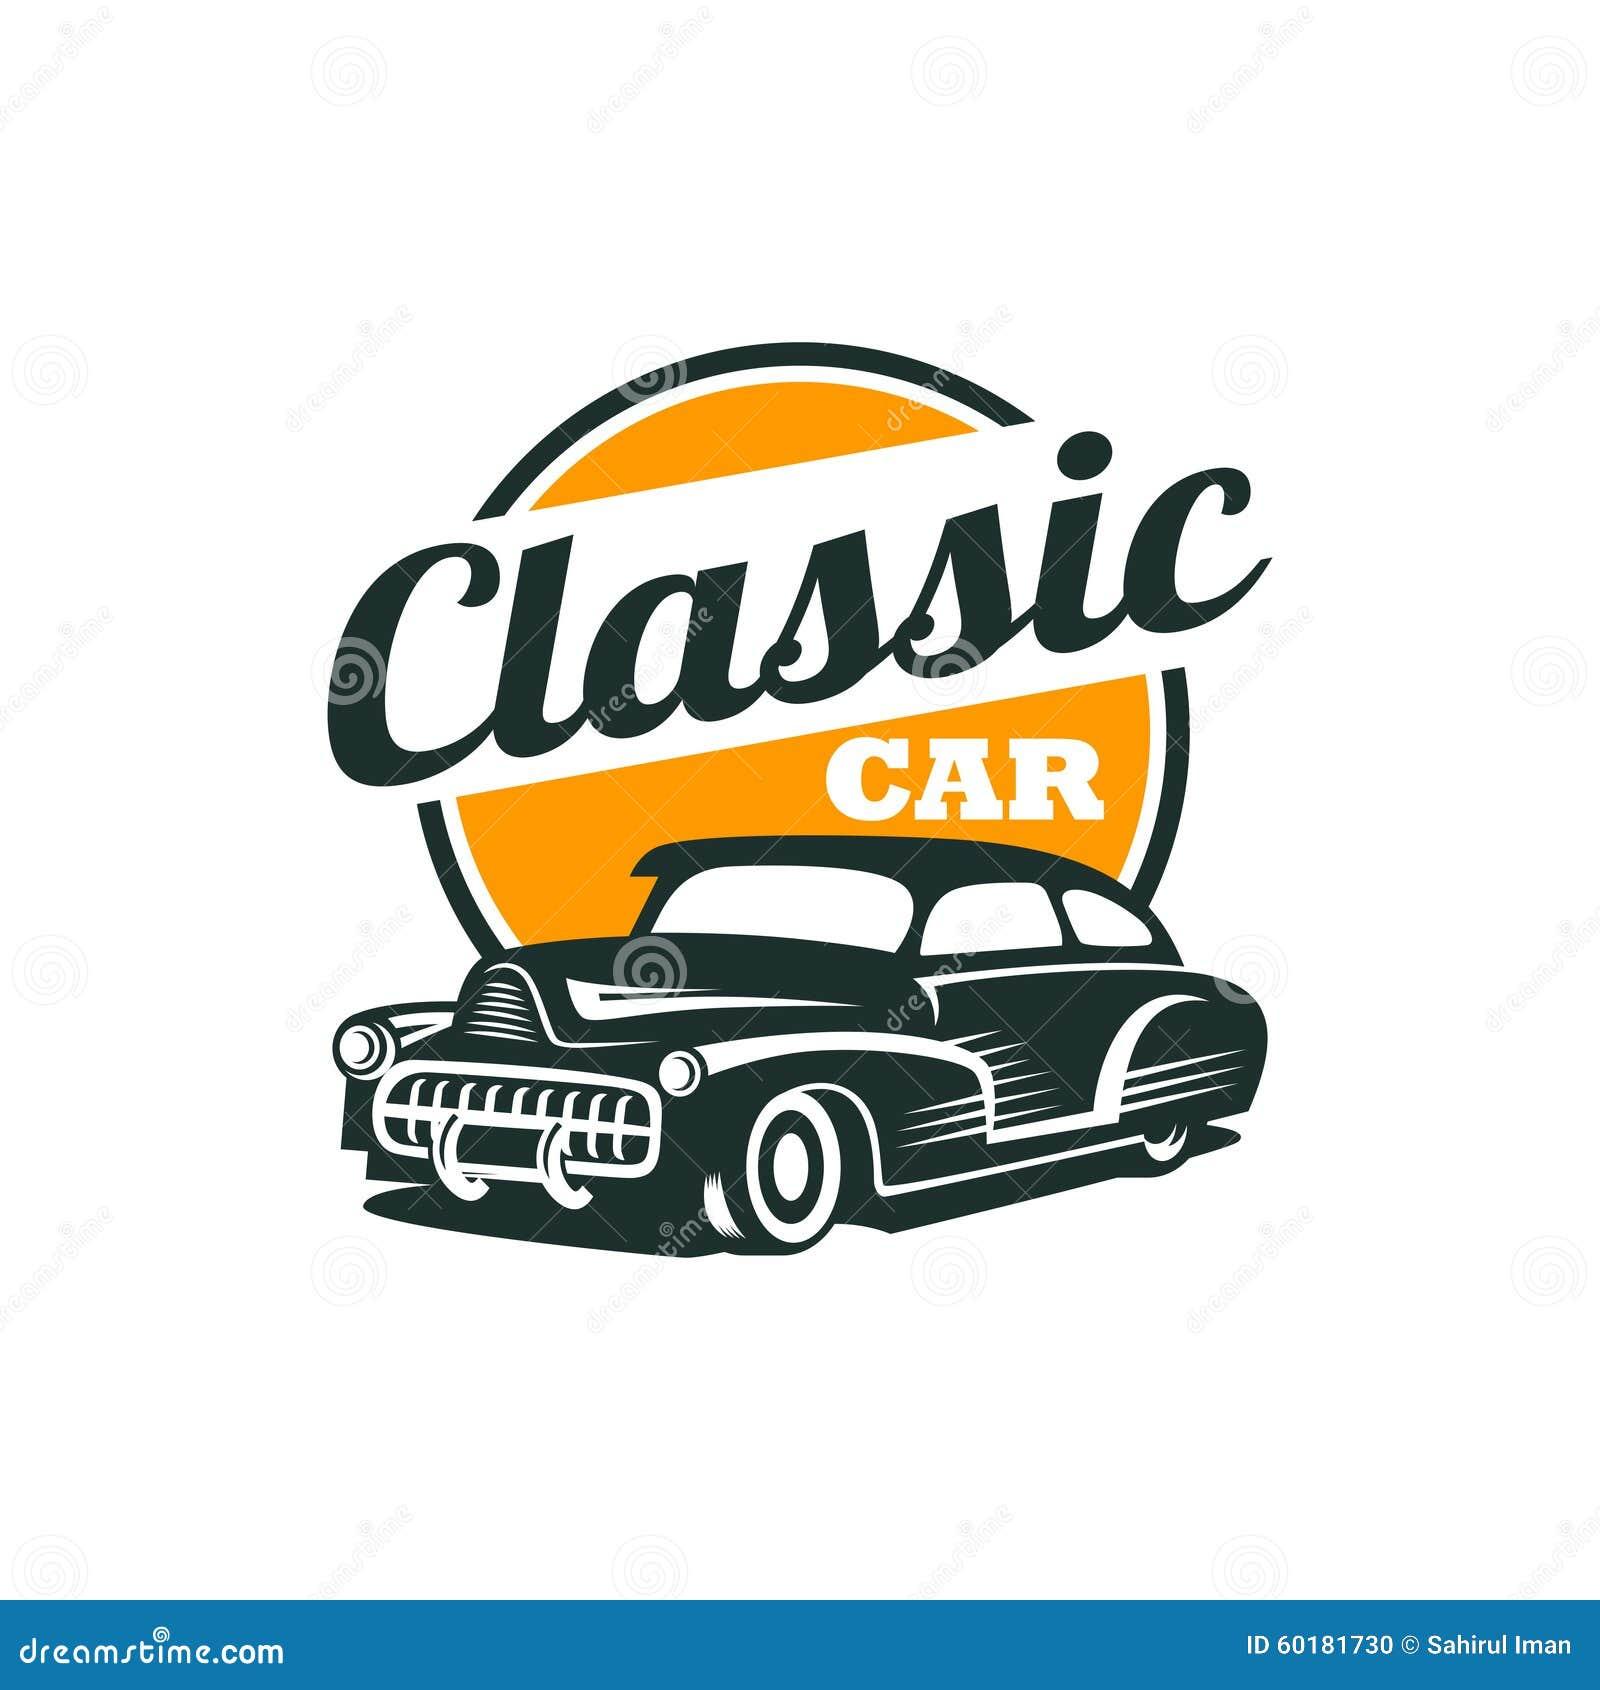 classic car vector template stock vector illustration of retro rh dreamstime com classic car vector art free classic car vector free download